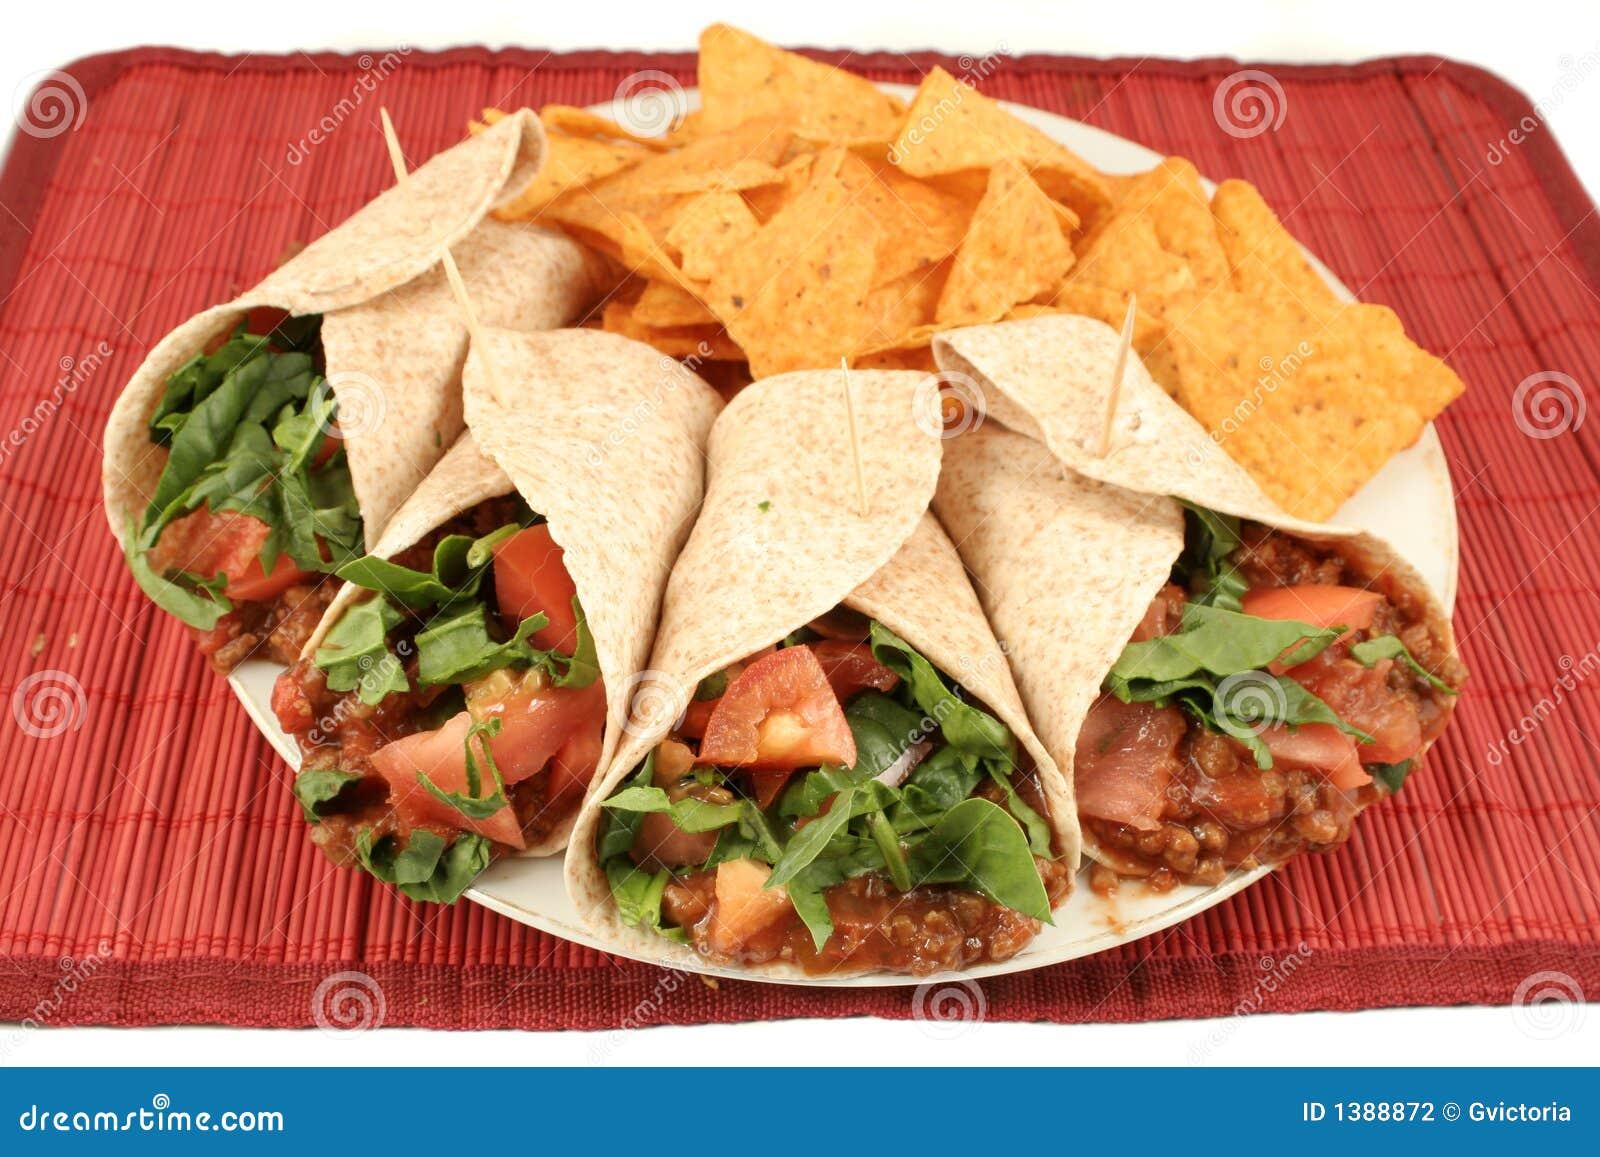 Nourriture mexicaine photo stock image du fajita d ner 1388872 - Cuisine mexicaine fajitas ...